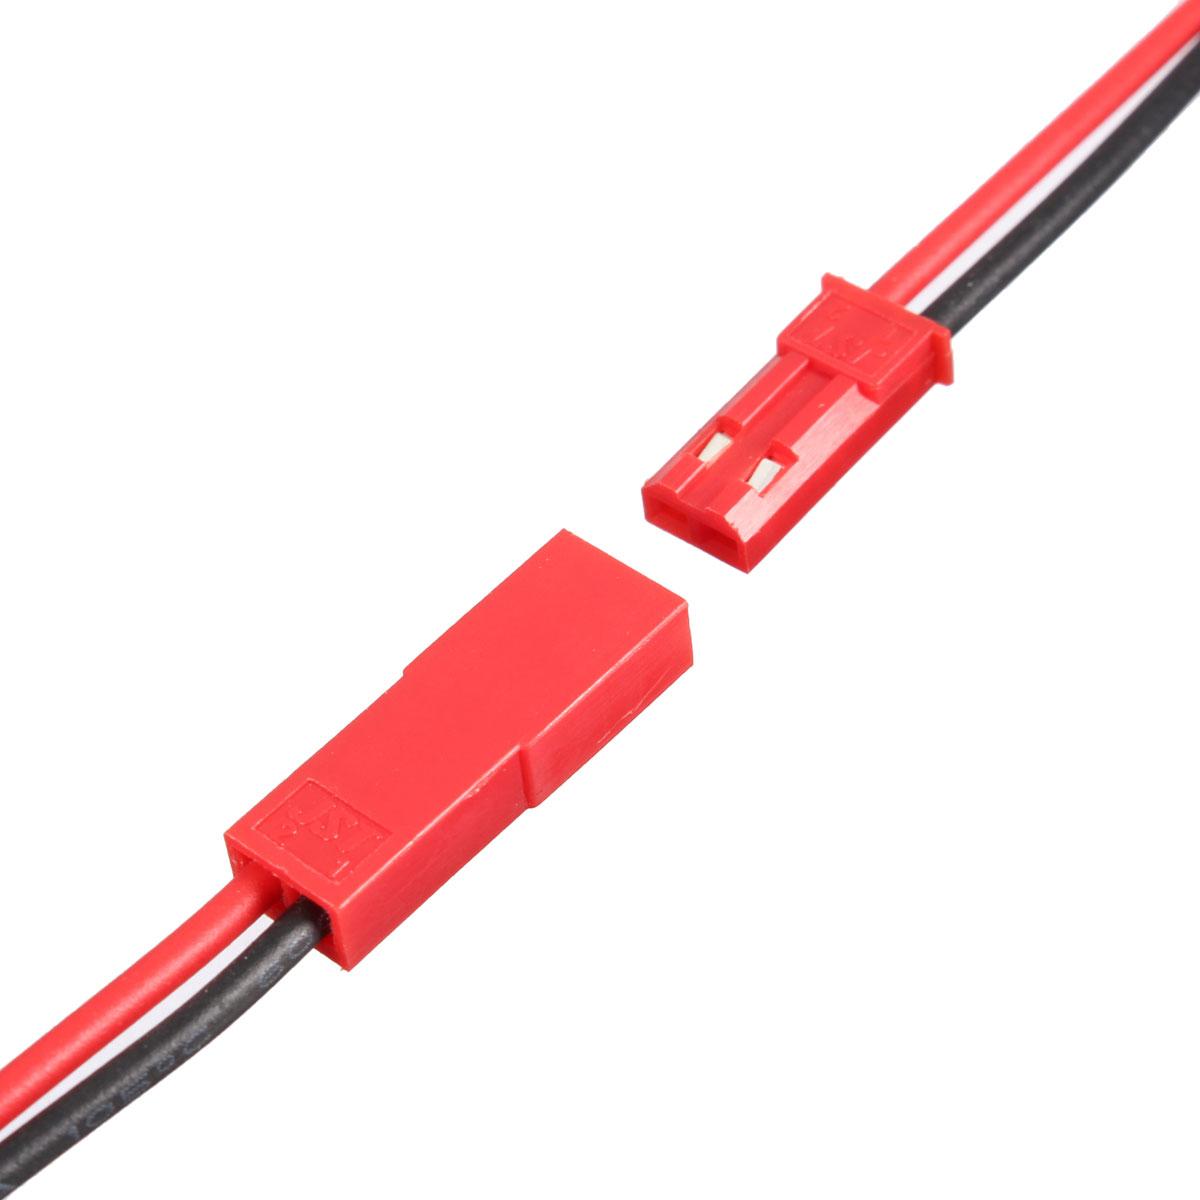 Female JST Connector Plug Cables